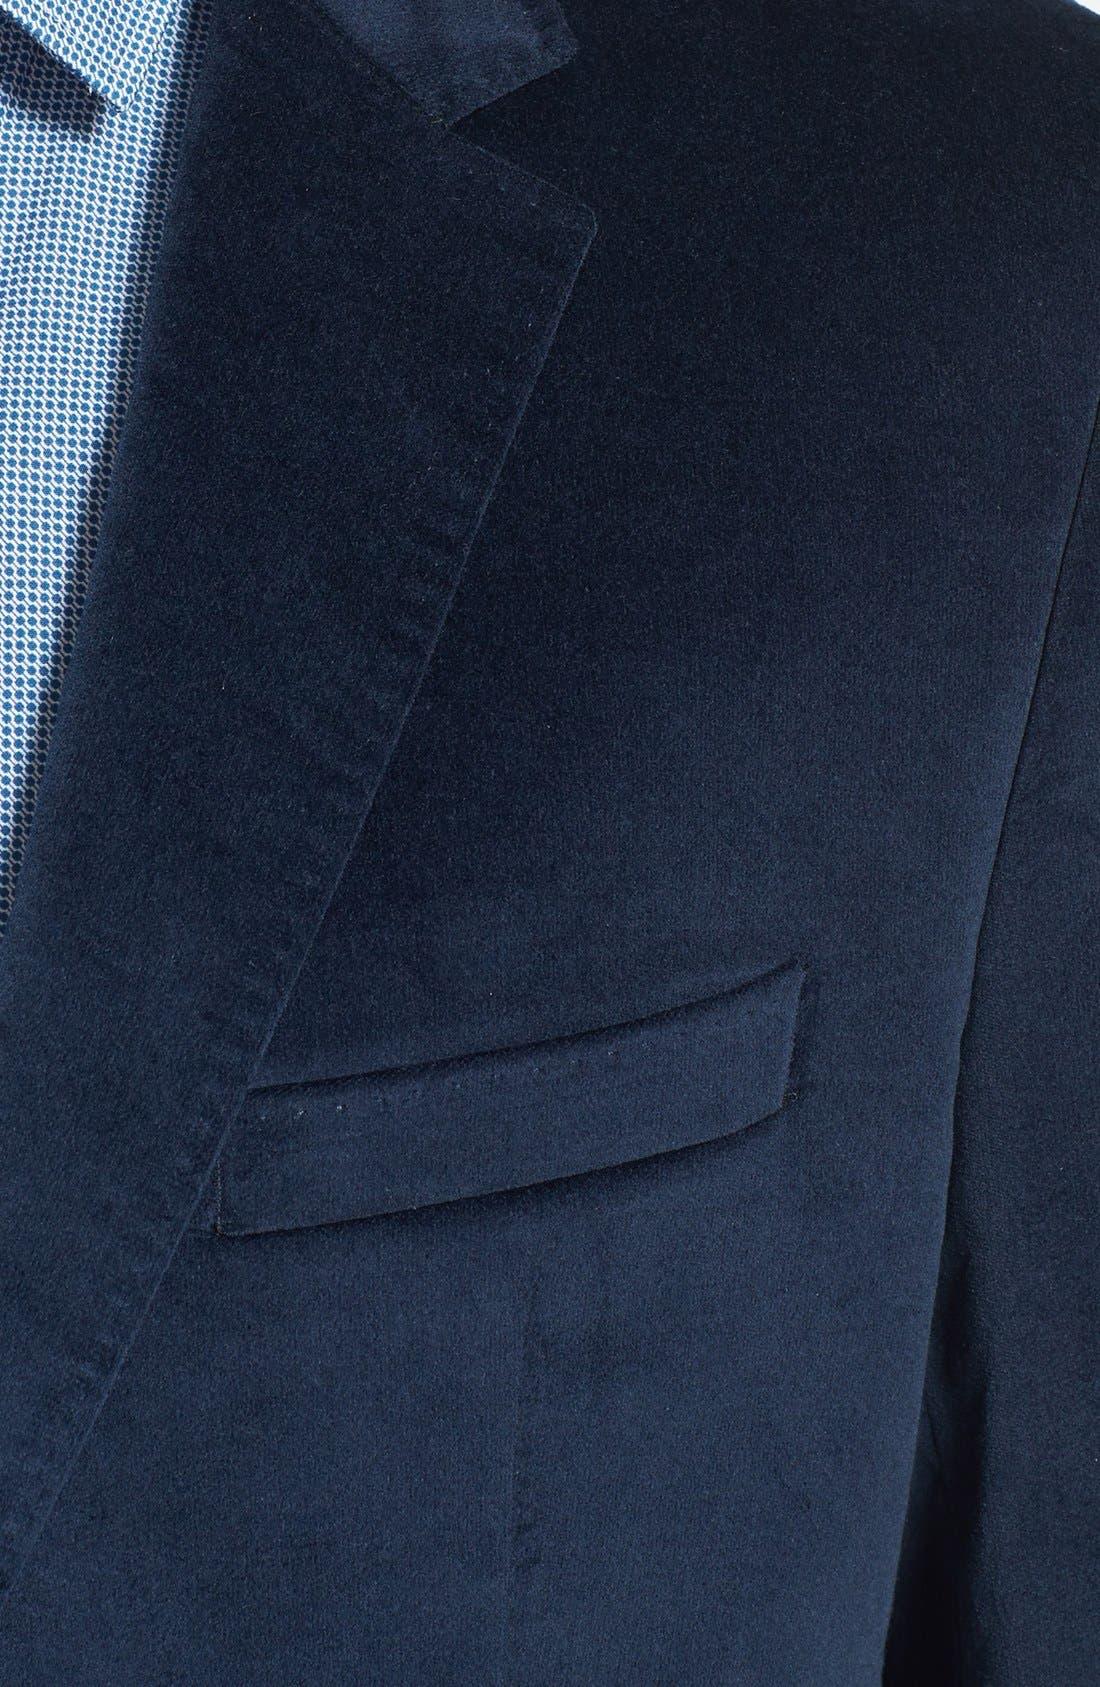 Alternate Image 3  - BOSS HUGO BOSS 'The Coast Us' Stretch Cotton Sportcoat